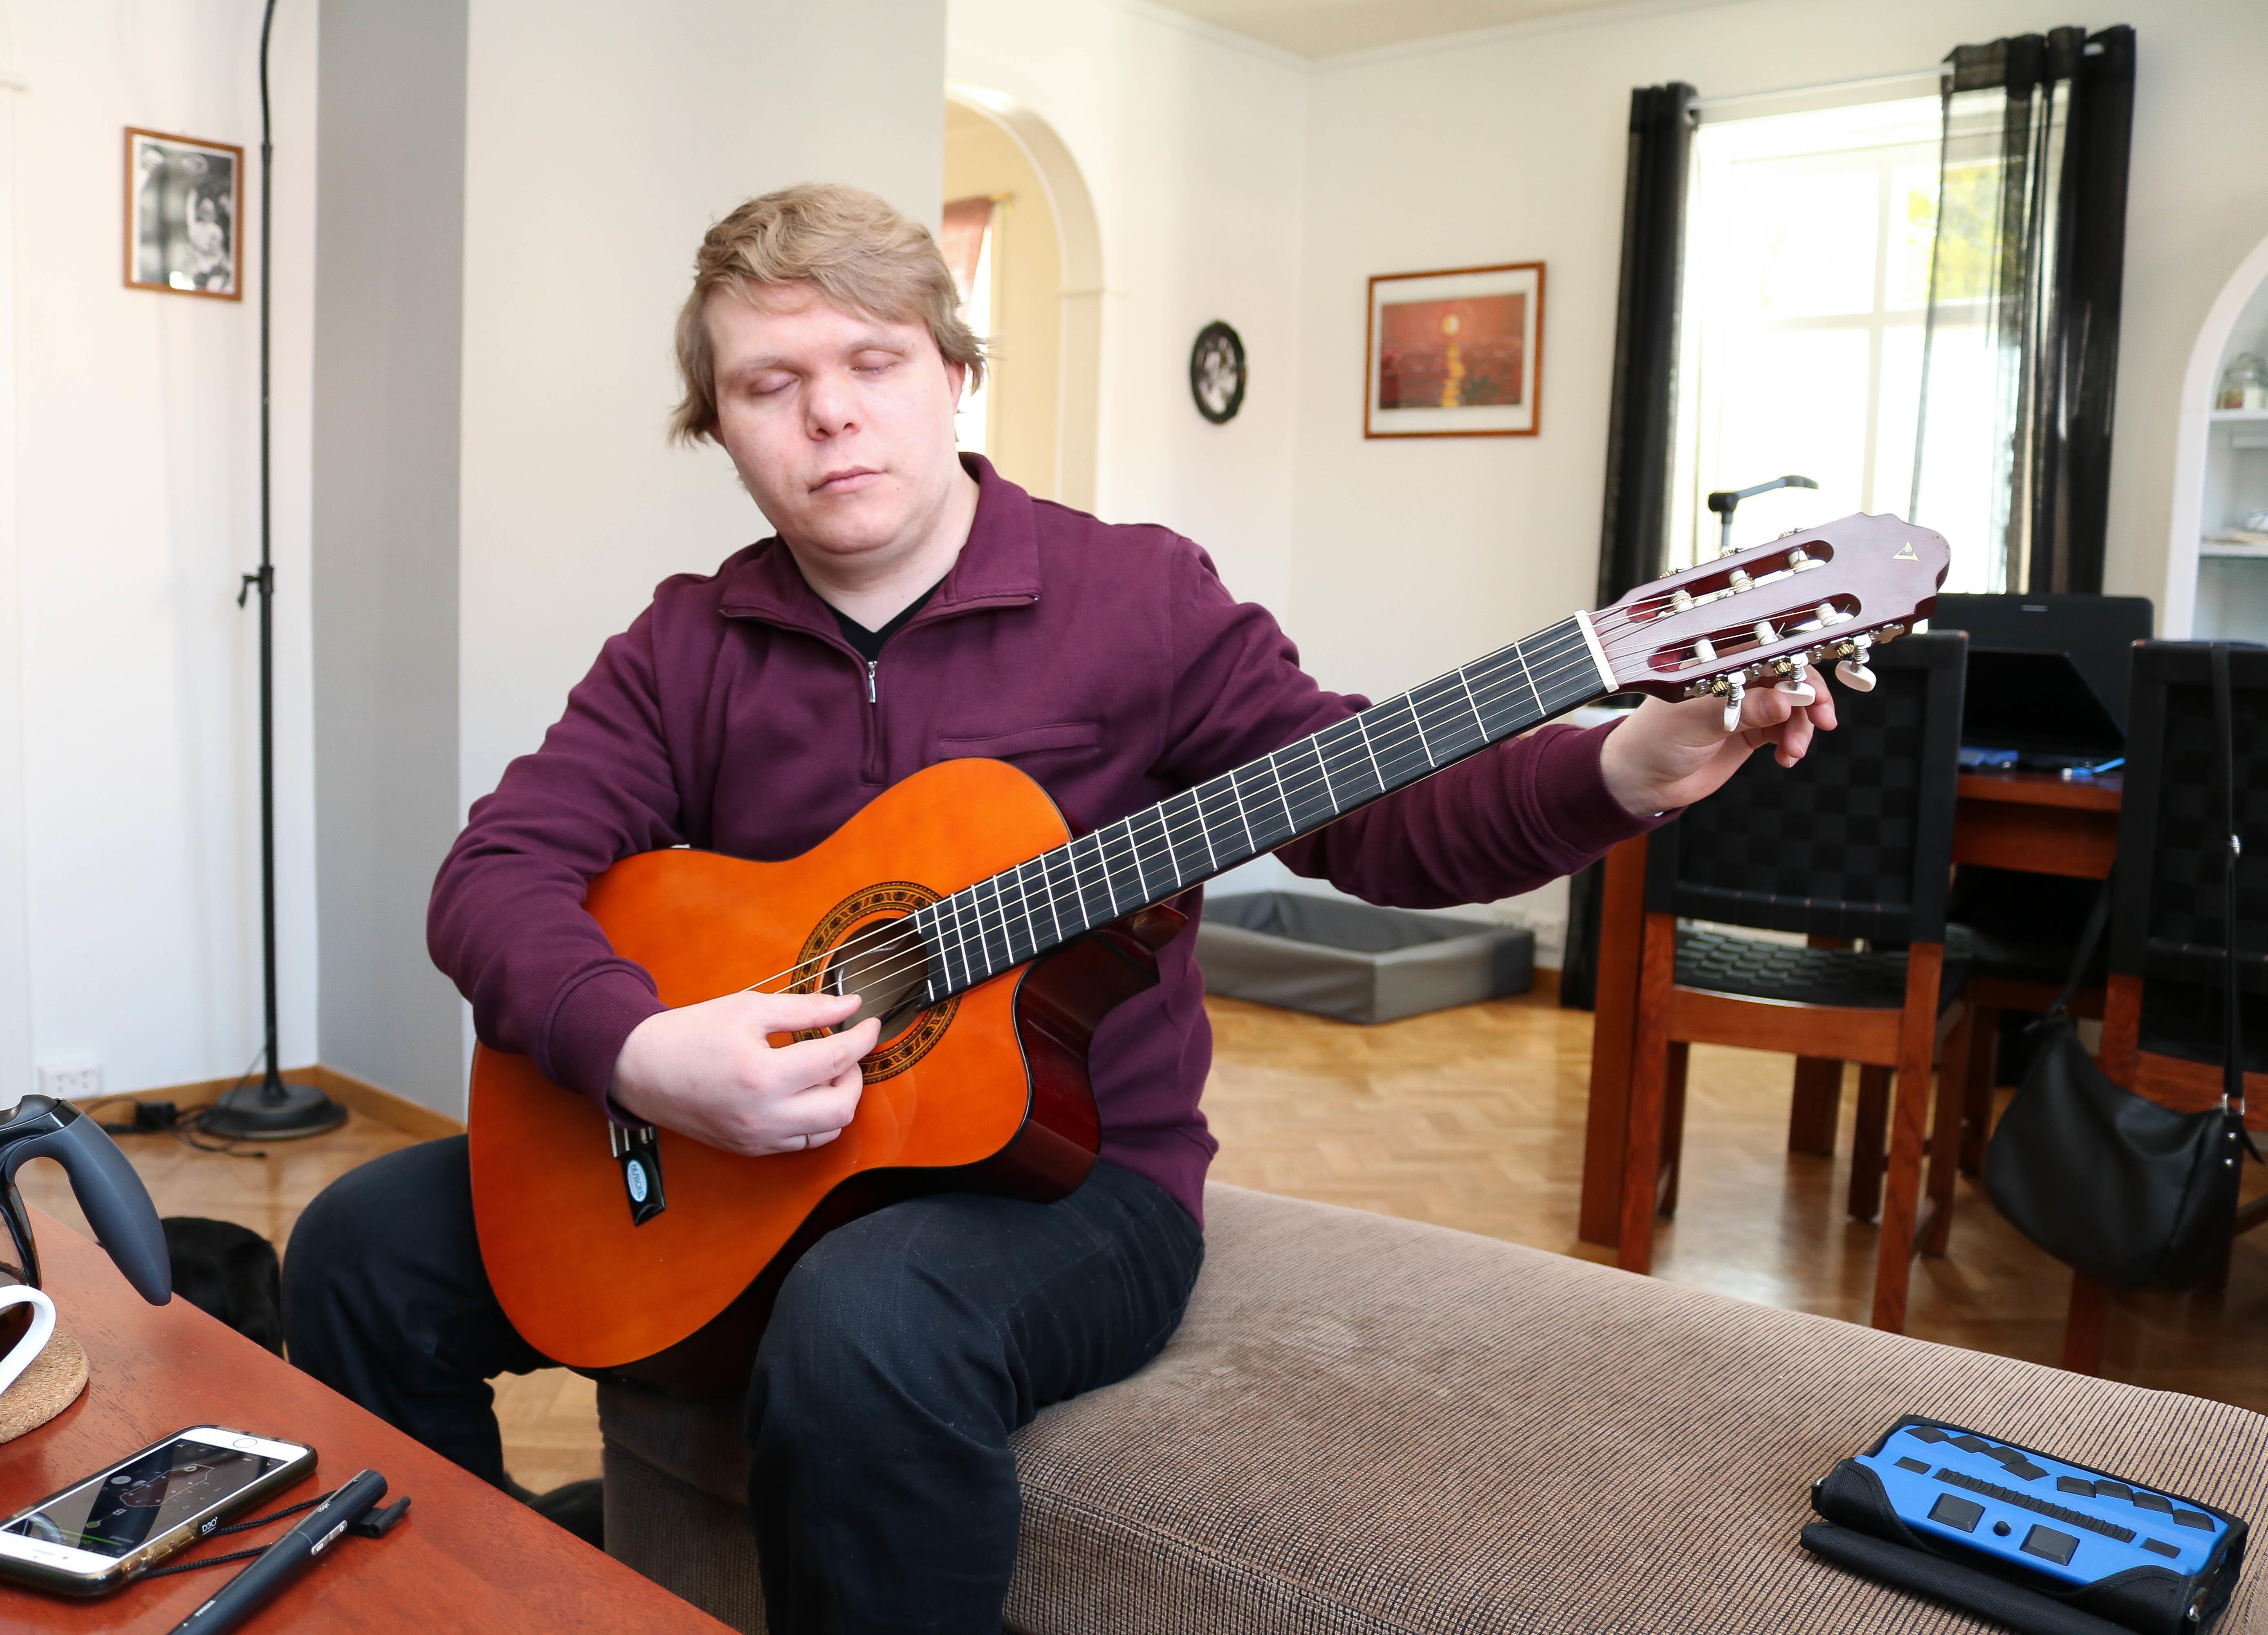 Døvblind mann med lilla genser sitter i sin stue og spiller på en gitar.